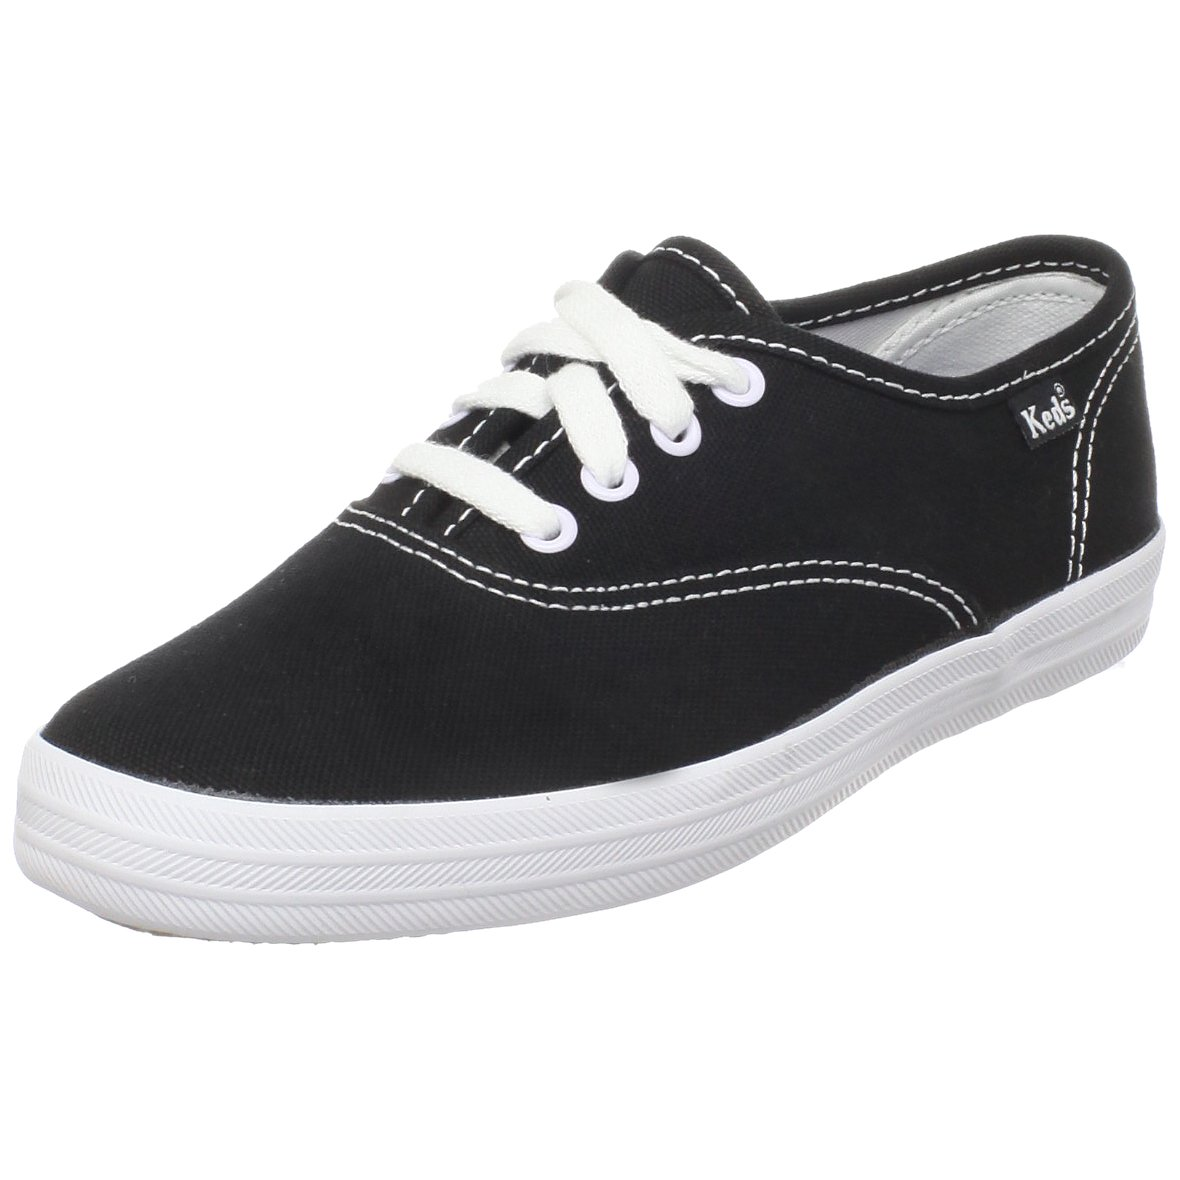 Keds Original Champion CVO Sneaker (Toddler/Little Kid/Big Kid),Black/White,12.5 M US Little Kid